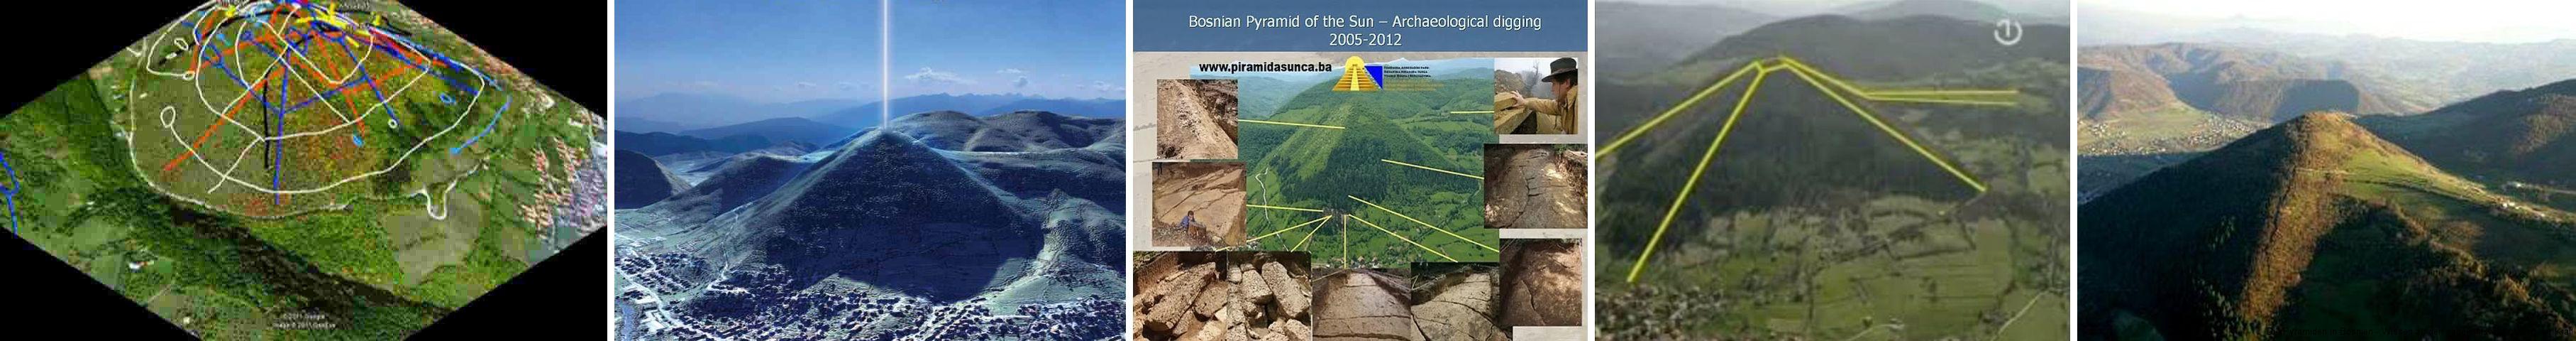 Banner Sonnenpyramide